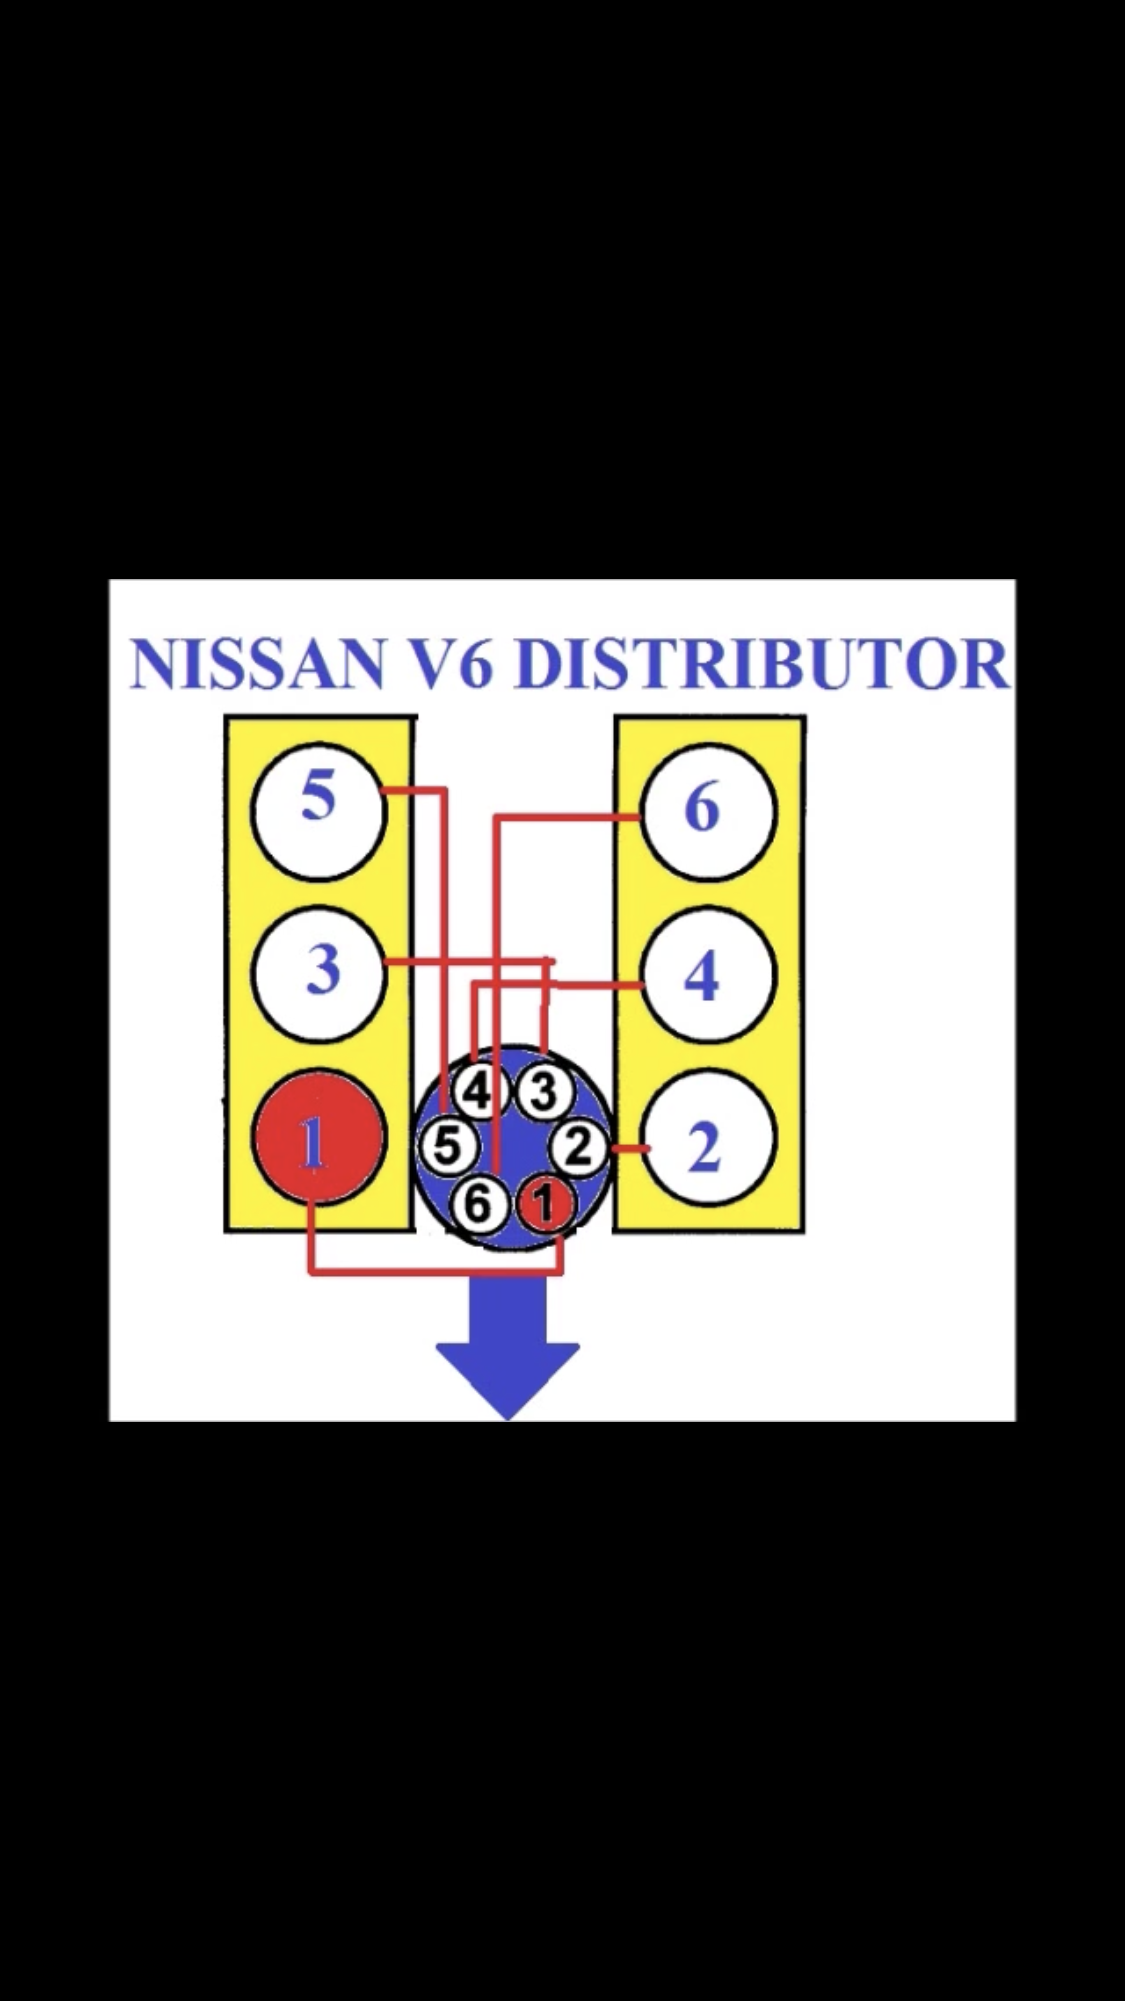 2002 nissan pathfinder owner s manual owners manual just give me rh justgivemethedamnmanual com 1996 1999 Nissan Pathfinder 2014 Nissan Frontier Truck